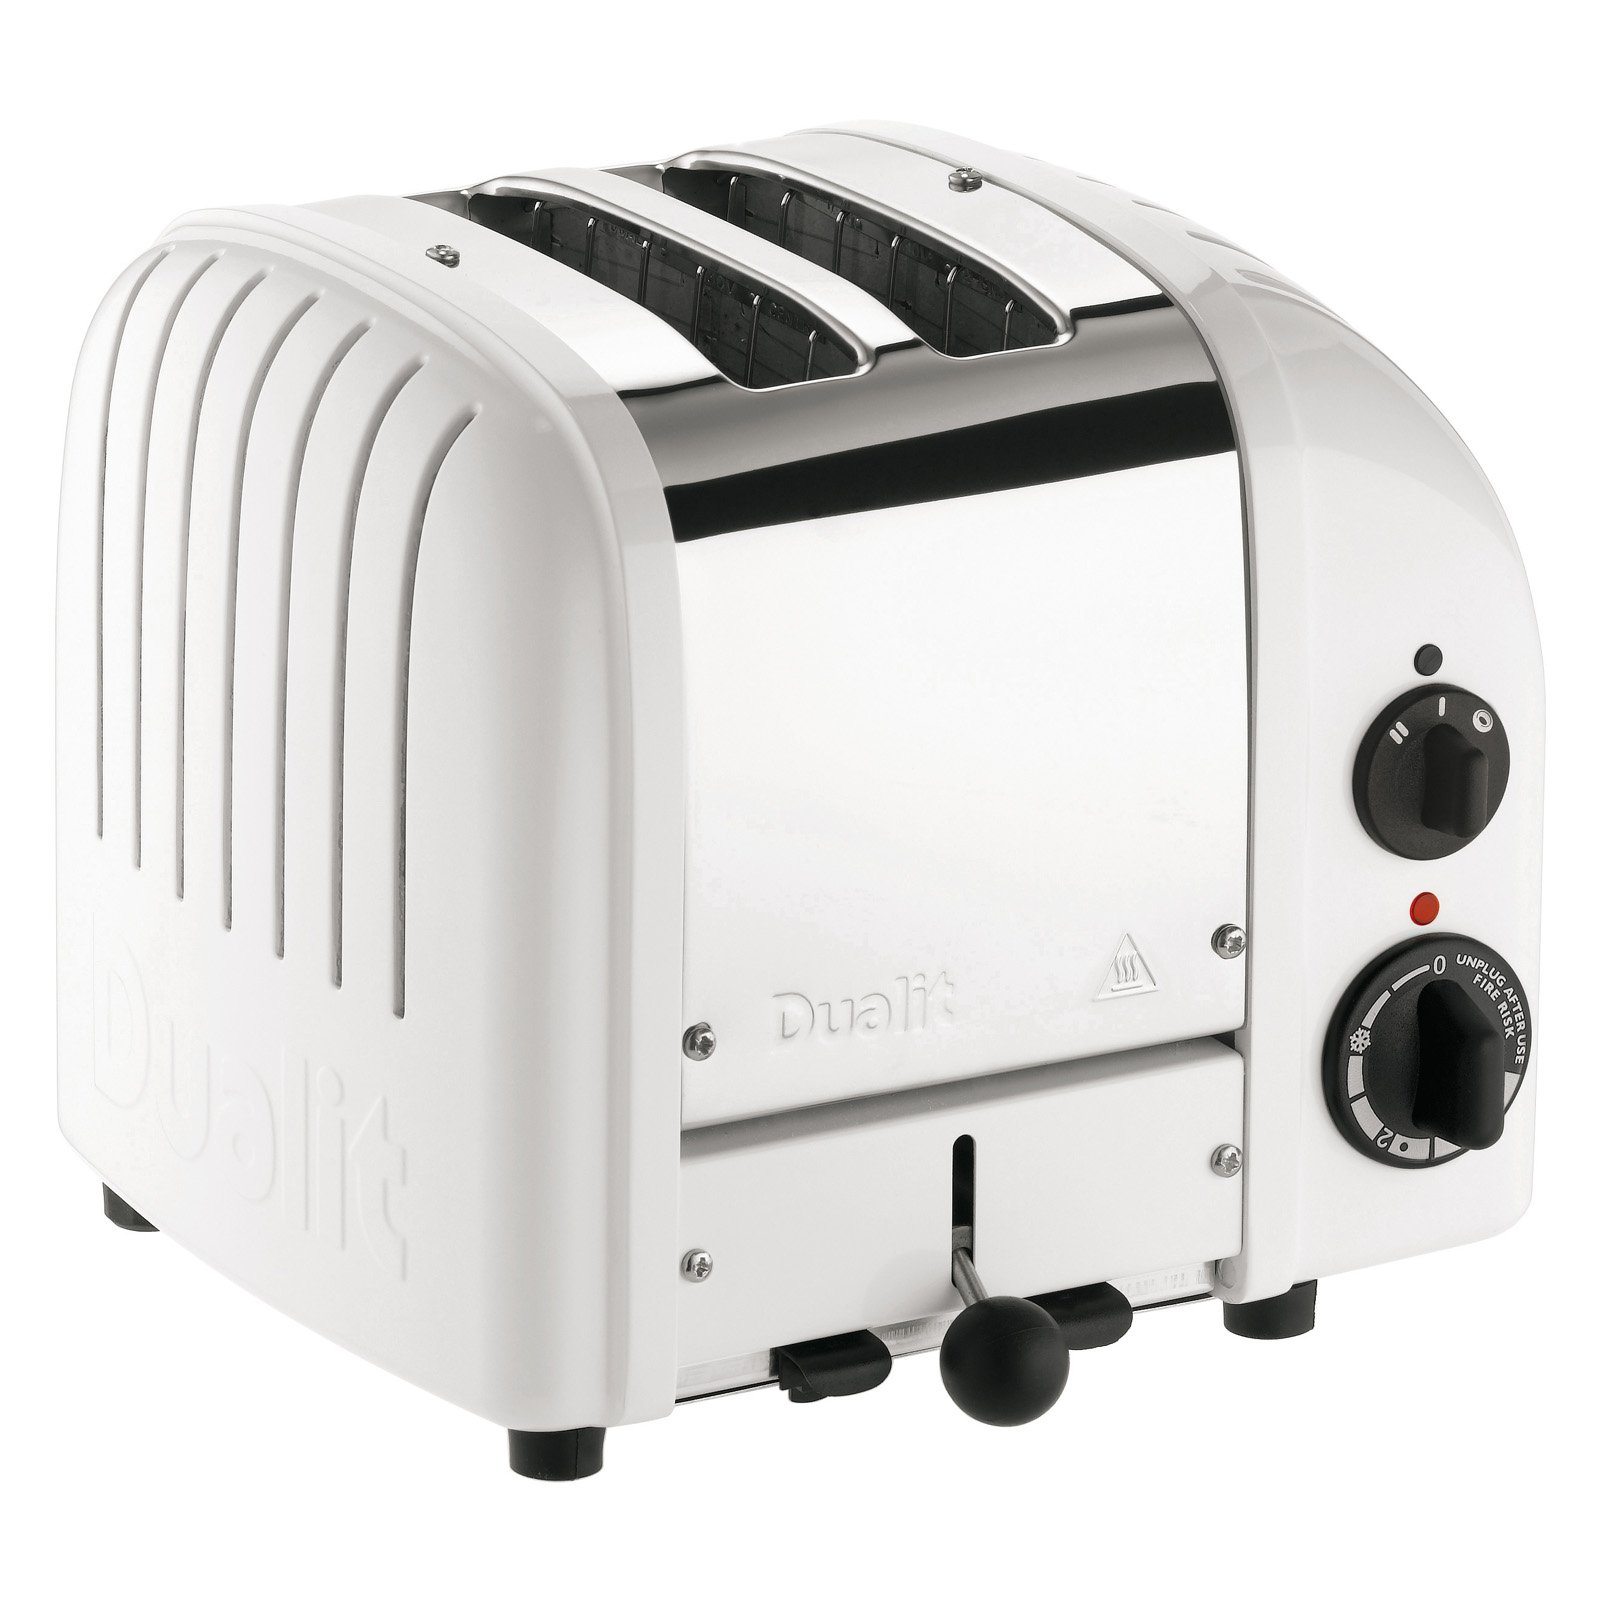 Dualit 27153 2 Slice NewGen Toaster - White